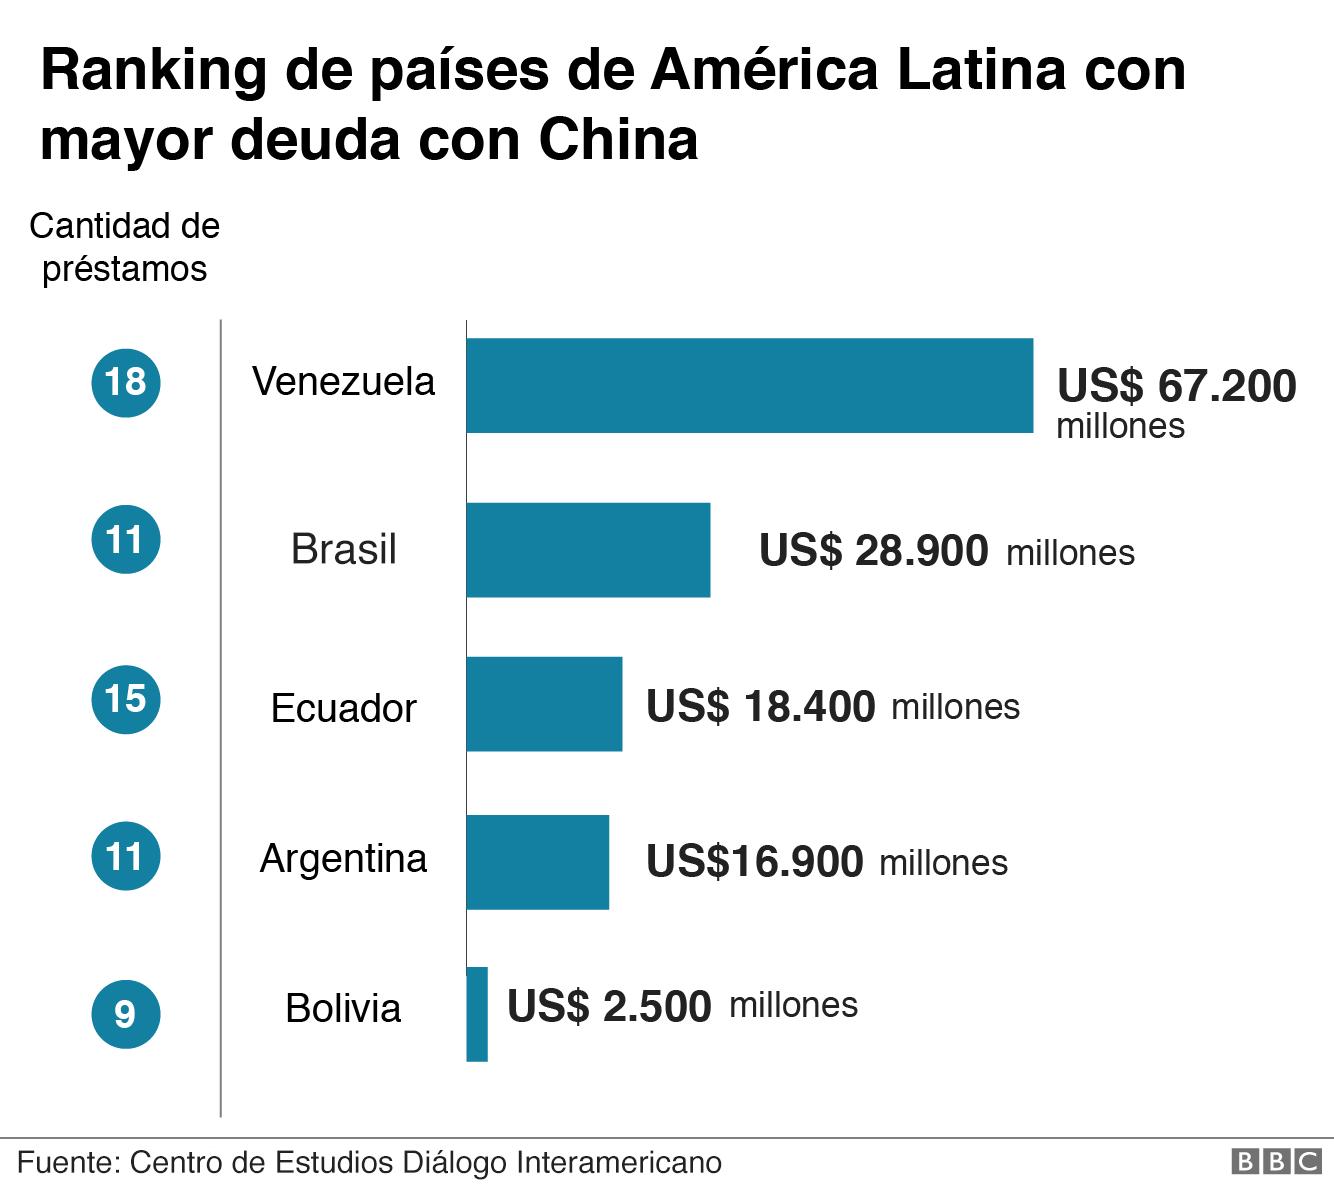 Ranking de países